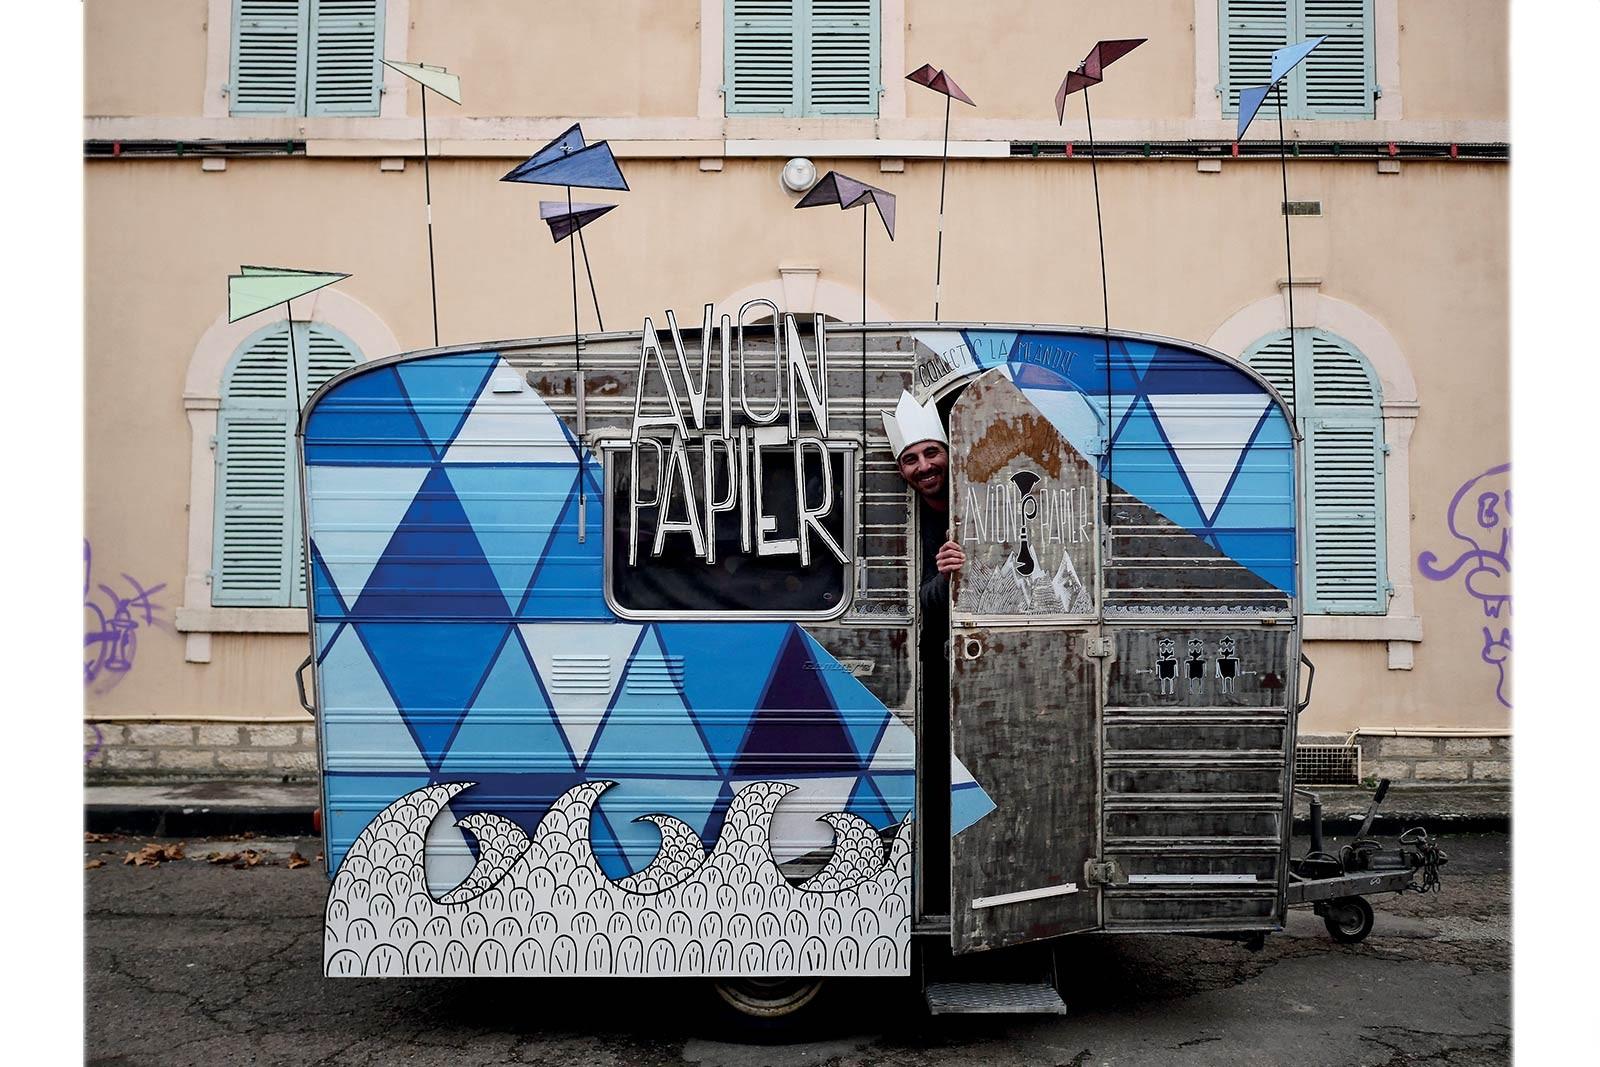 Avion Papier festival charleroi bis-arts 2018